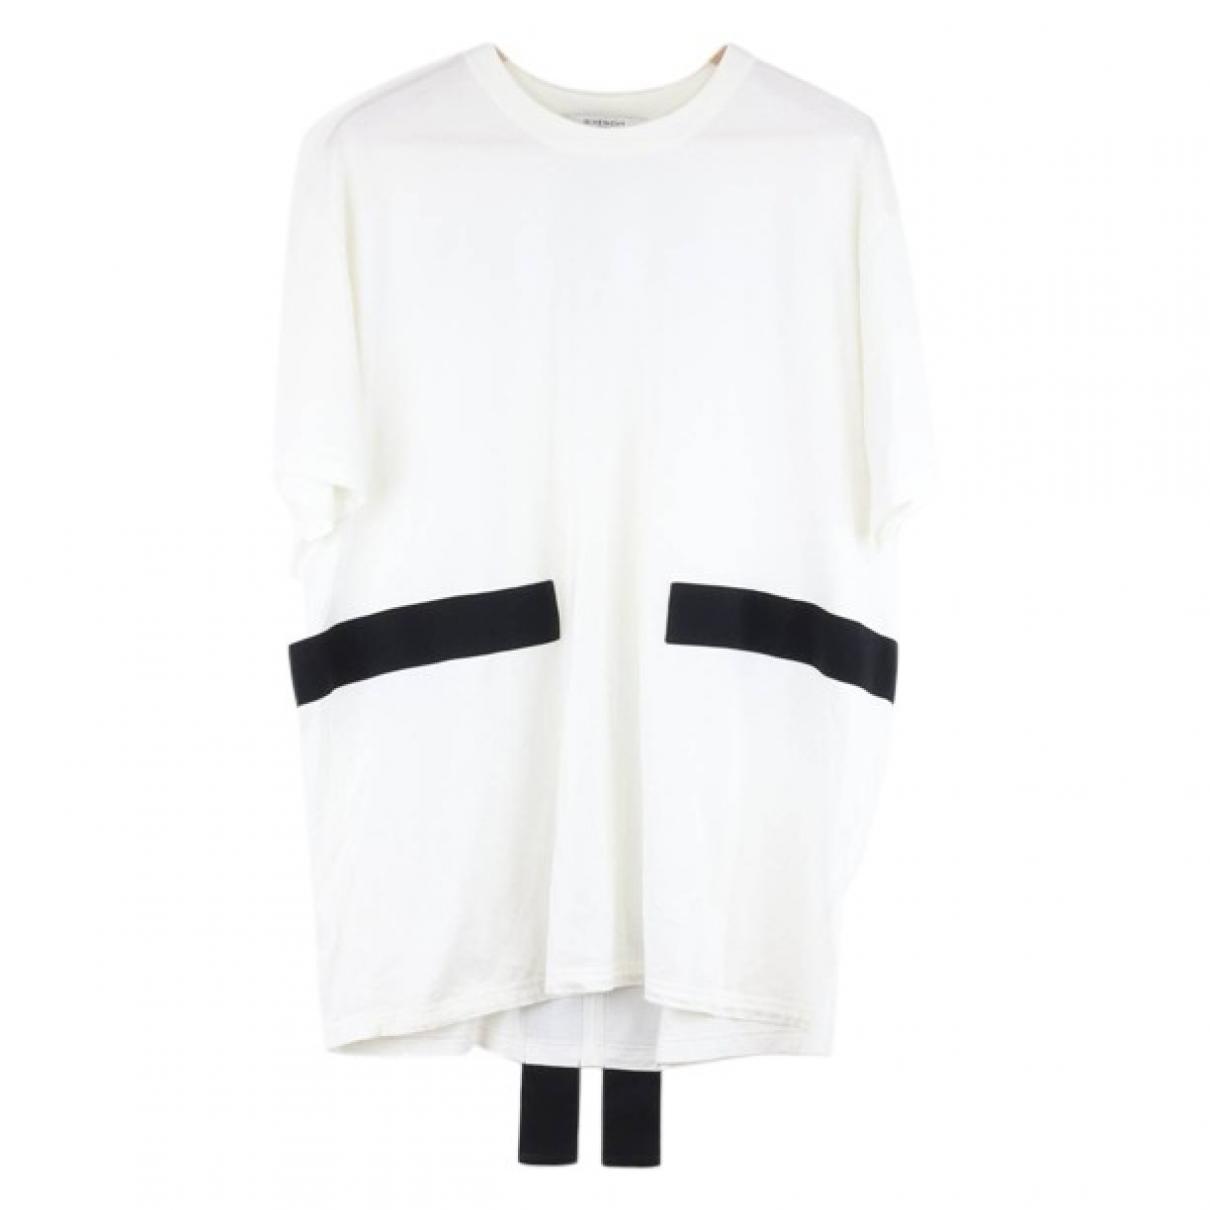 Givenchy - Tee shirts   pour homme en coton - blanc